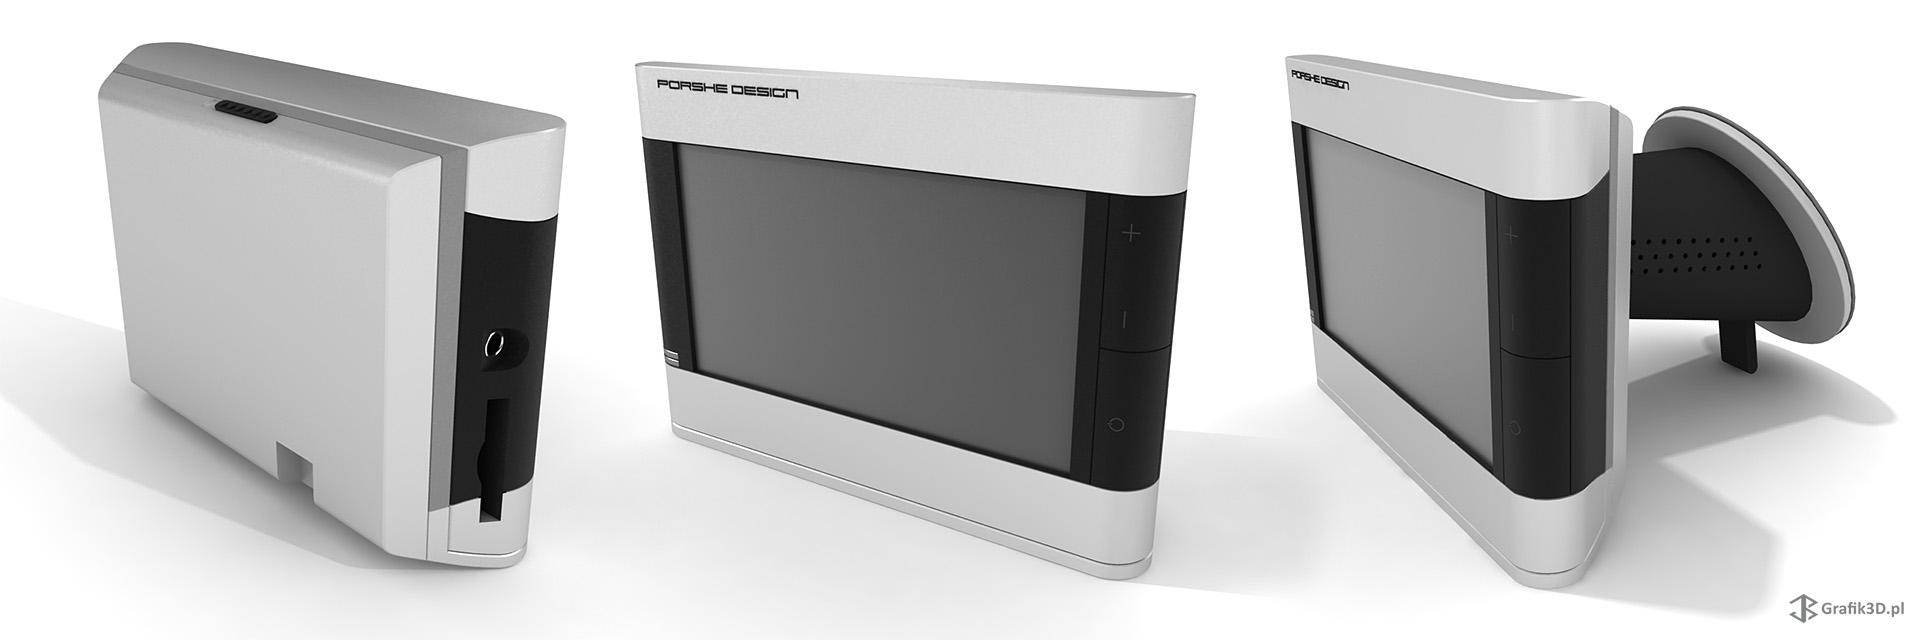 Model 3d Nawigacji Porshe Design